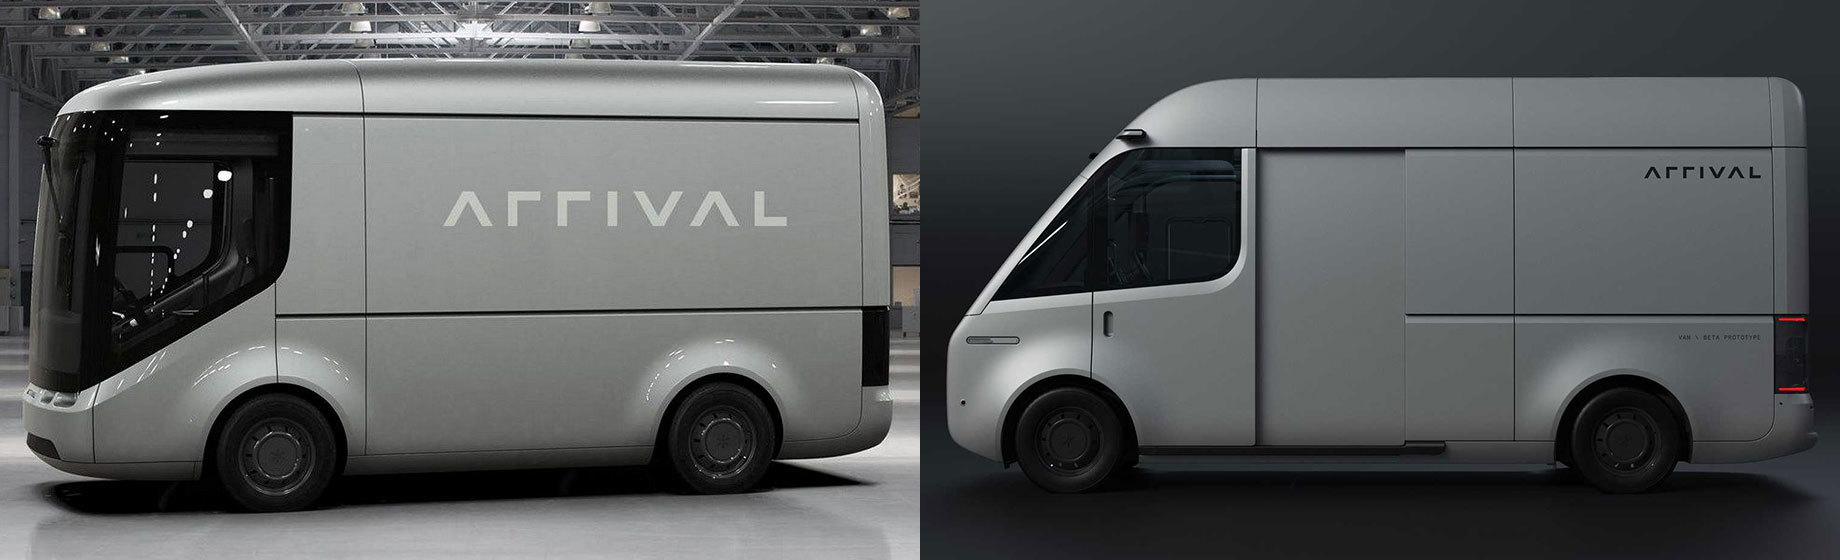 Фирма Arrival изменила дизайн батарейного фургона